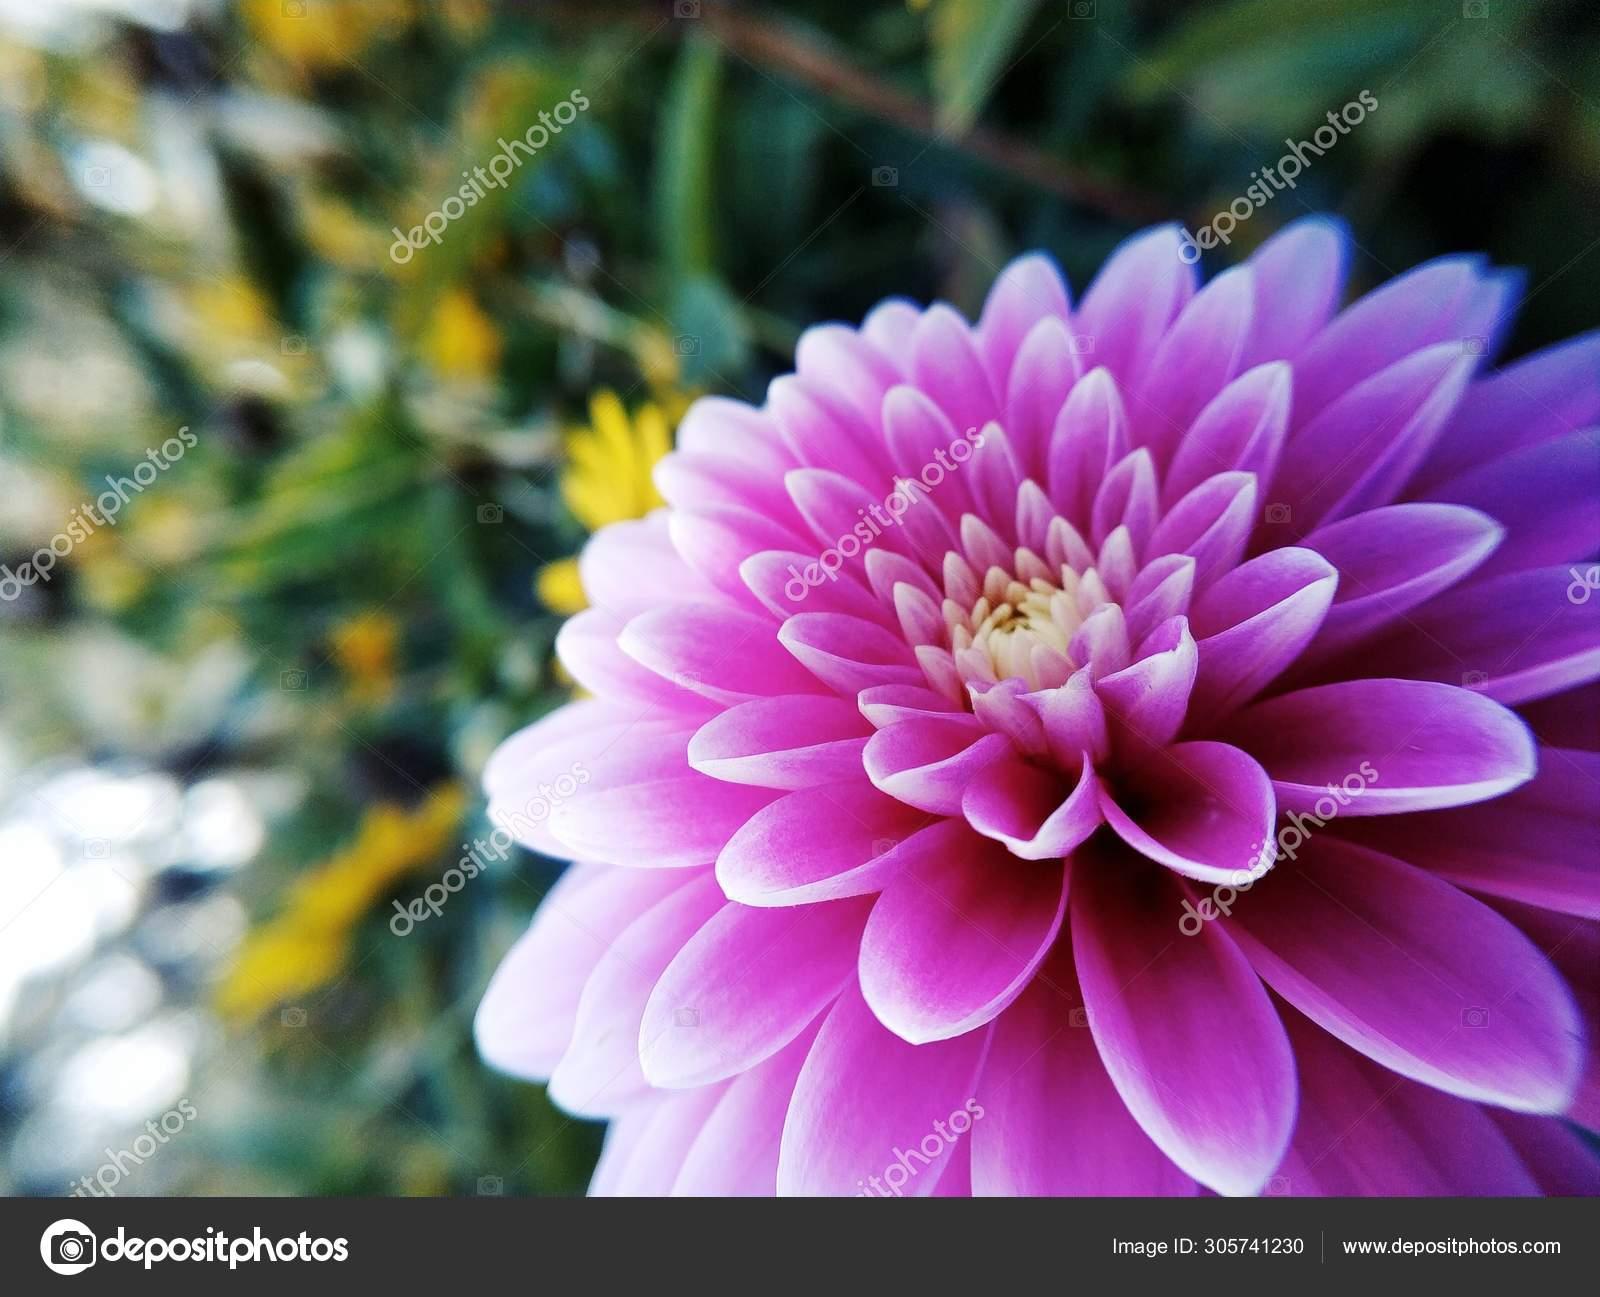 Dahlia Rosa Flor Jardim Stock Photo C Imaginechina Tuchong 305741230